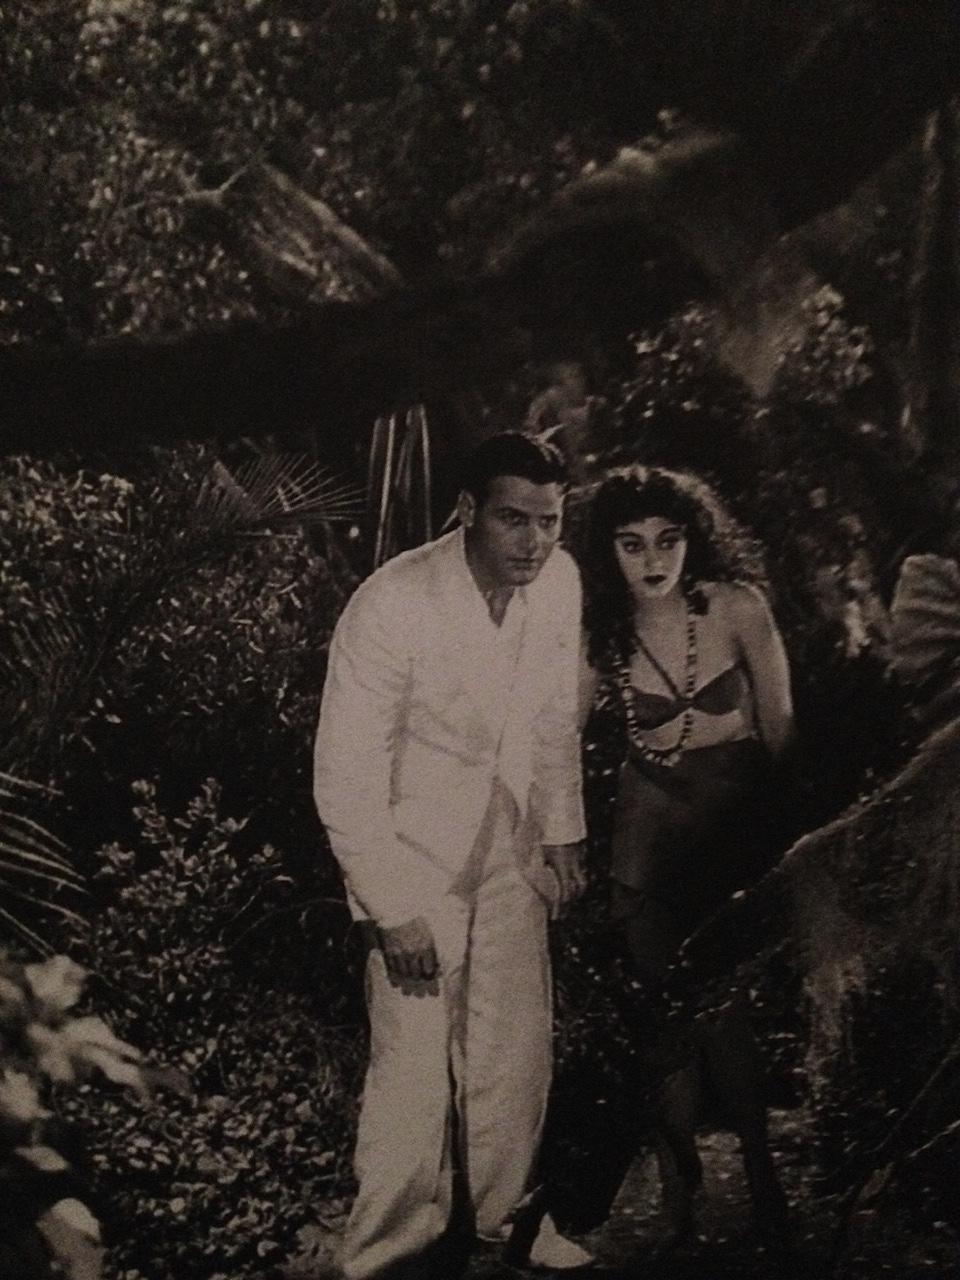 Richard Arlen and Kathleen Burke